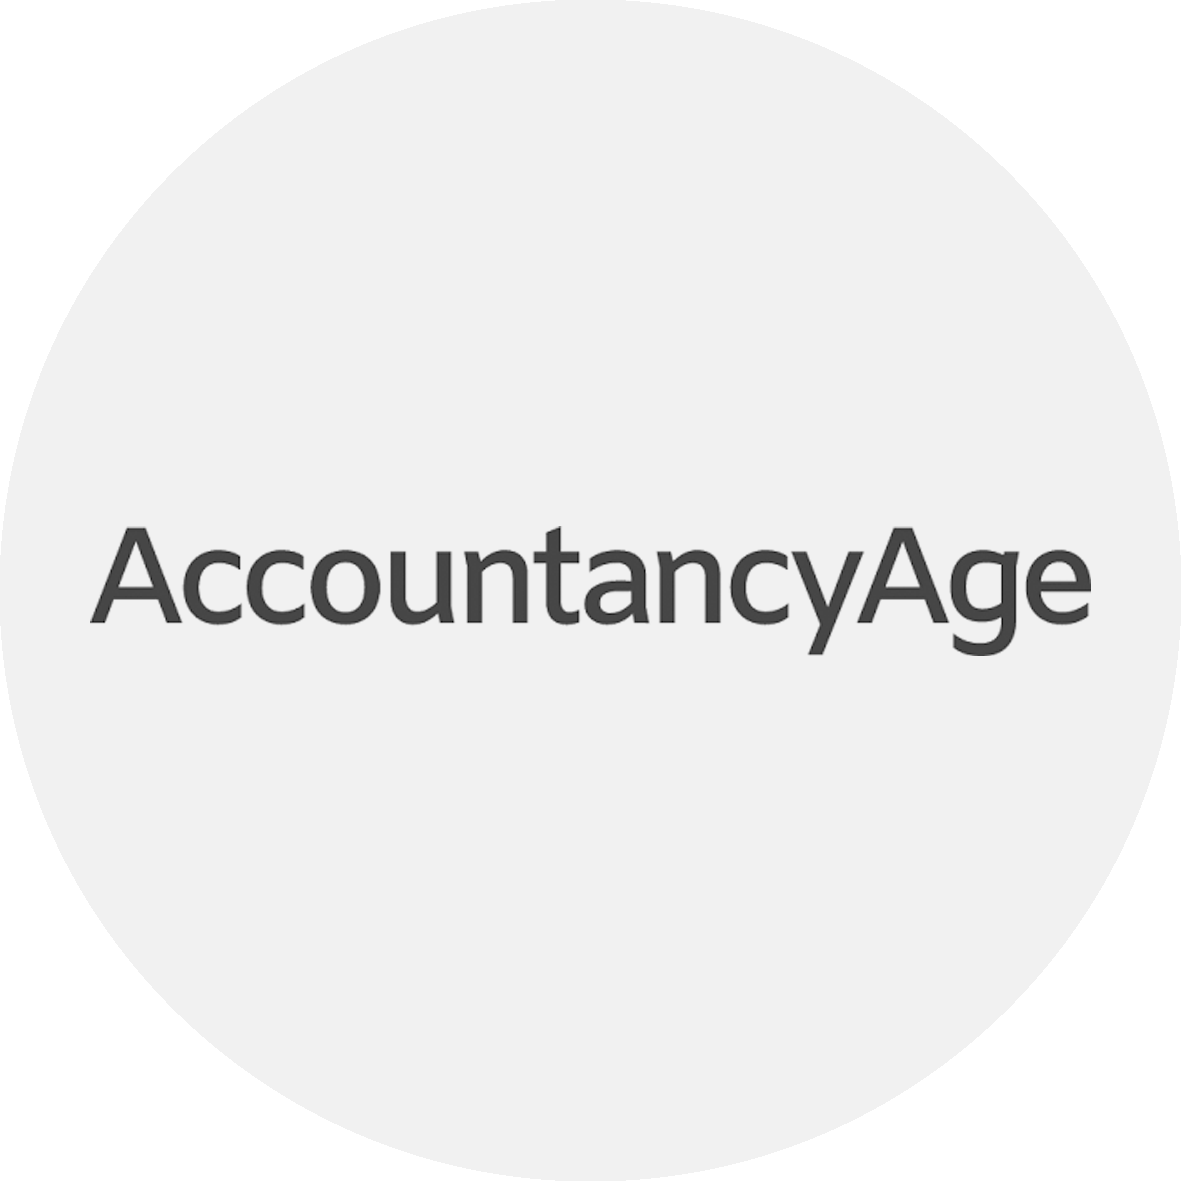 AccountancyAge | Top 50 Women in Finance 2019